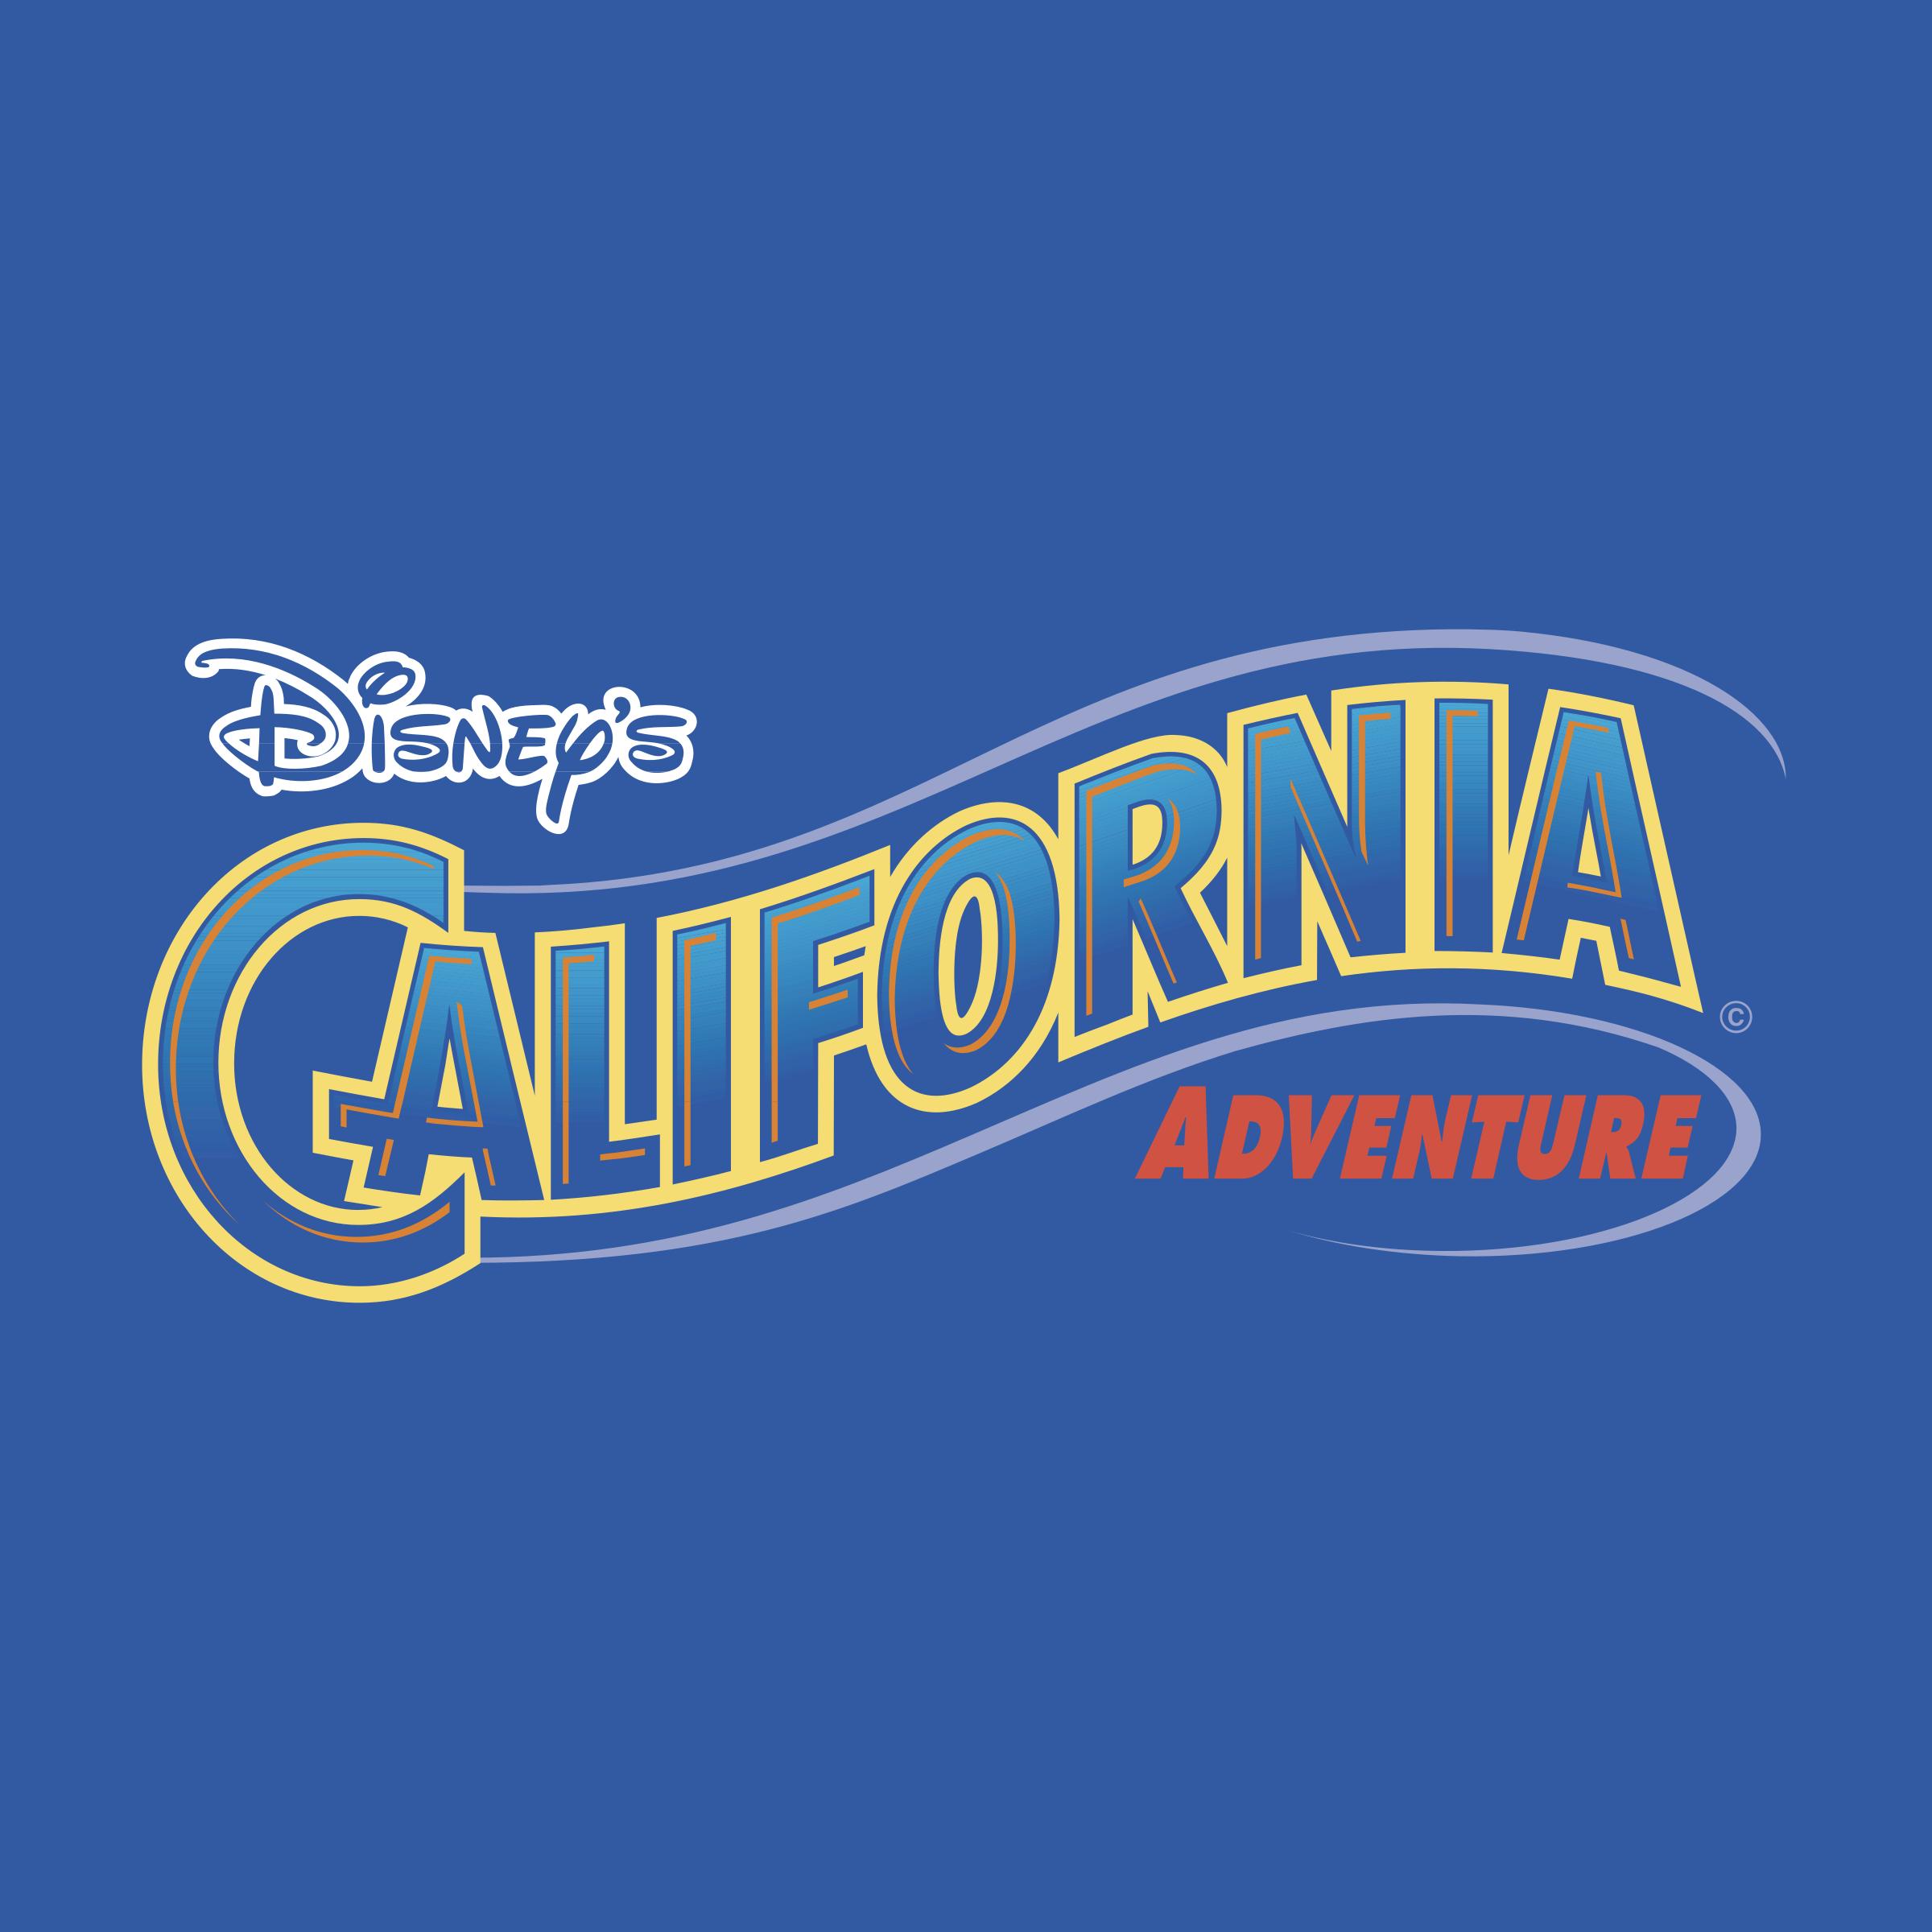 Disney\'s California Adventure Logo PNG Transparent & SVG.